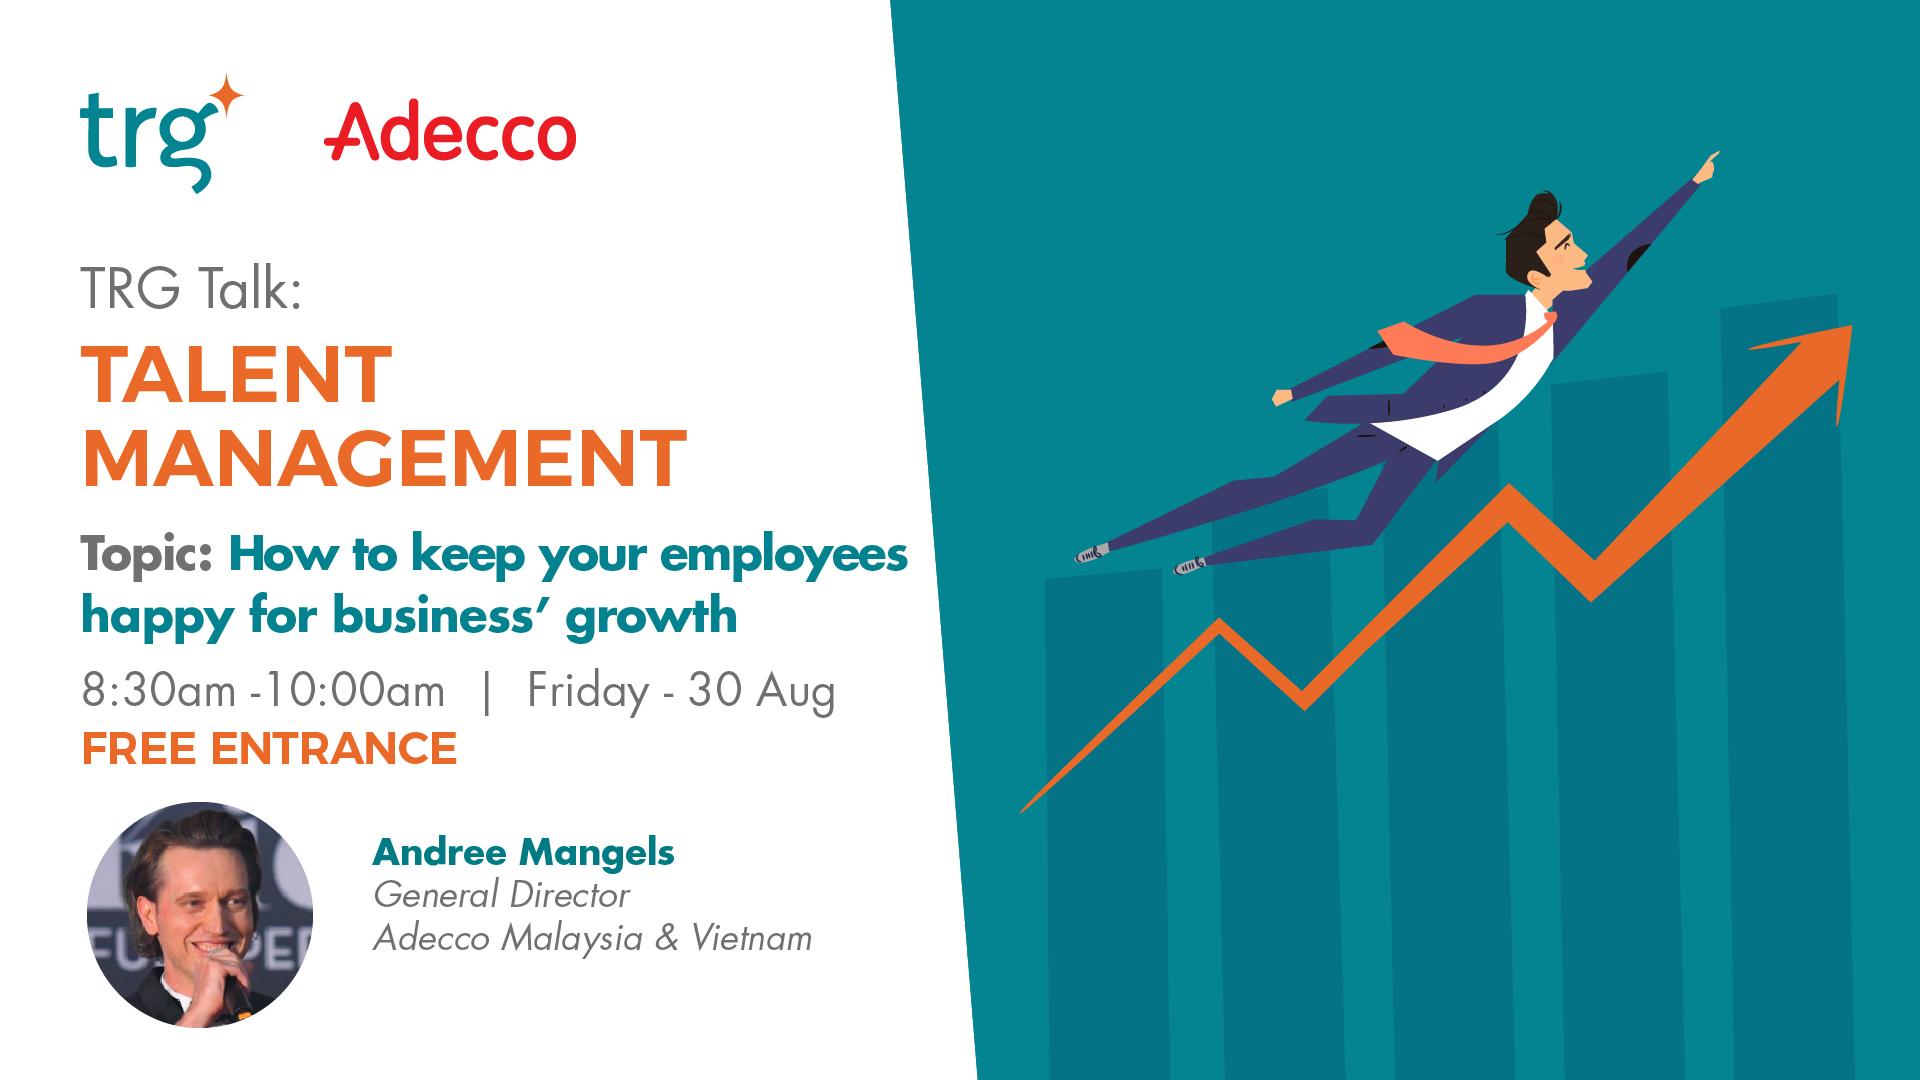 TRG Talk Talent Management event banner